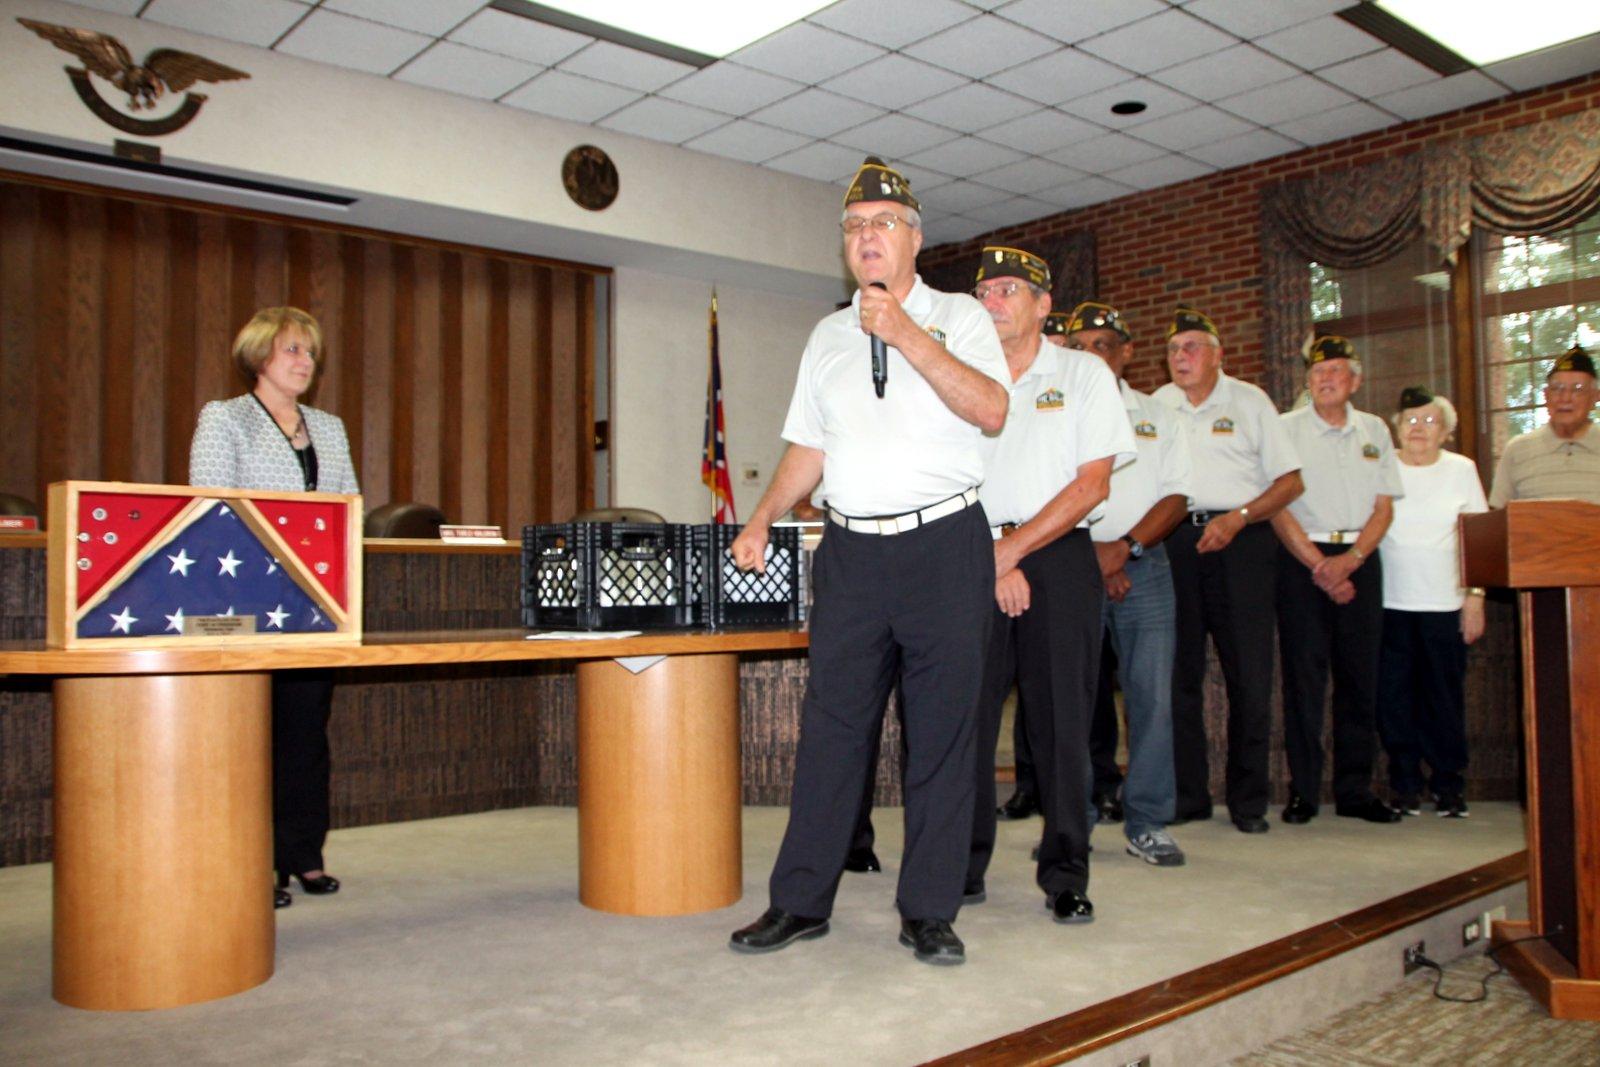 Veterans presenting American flag